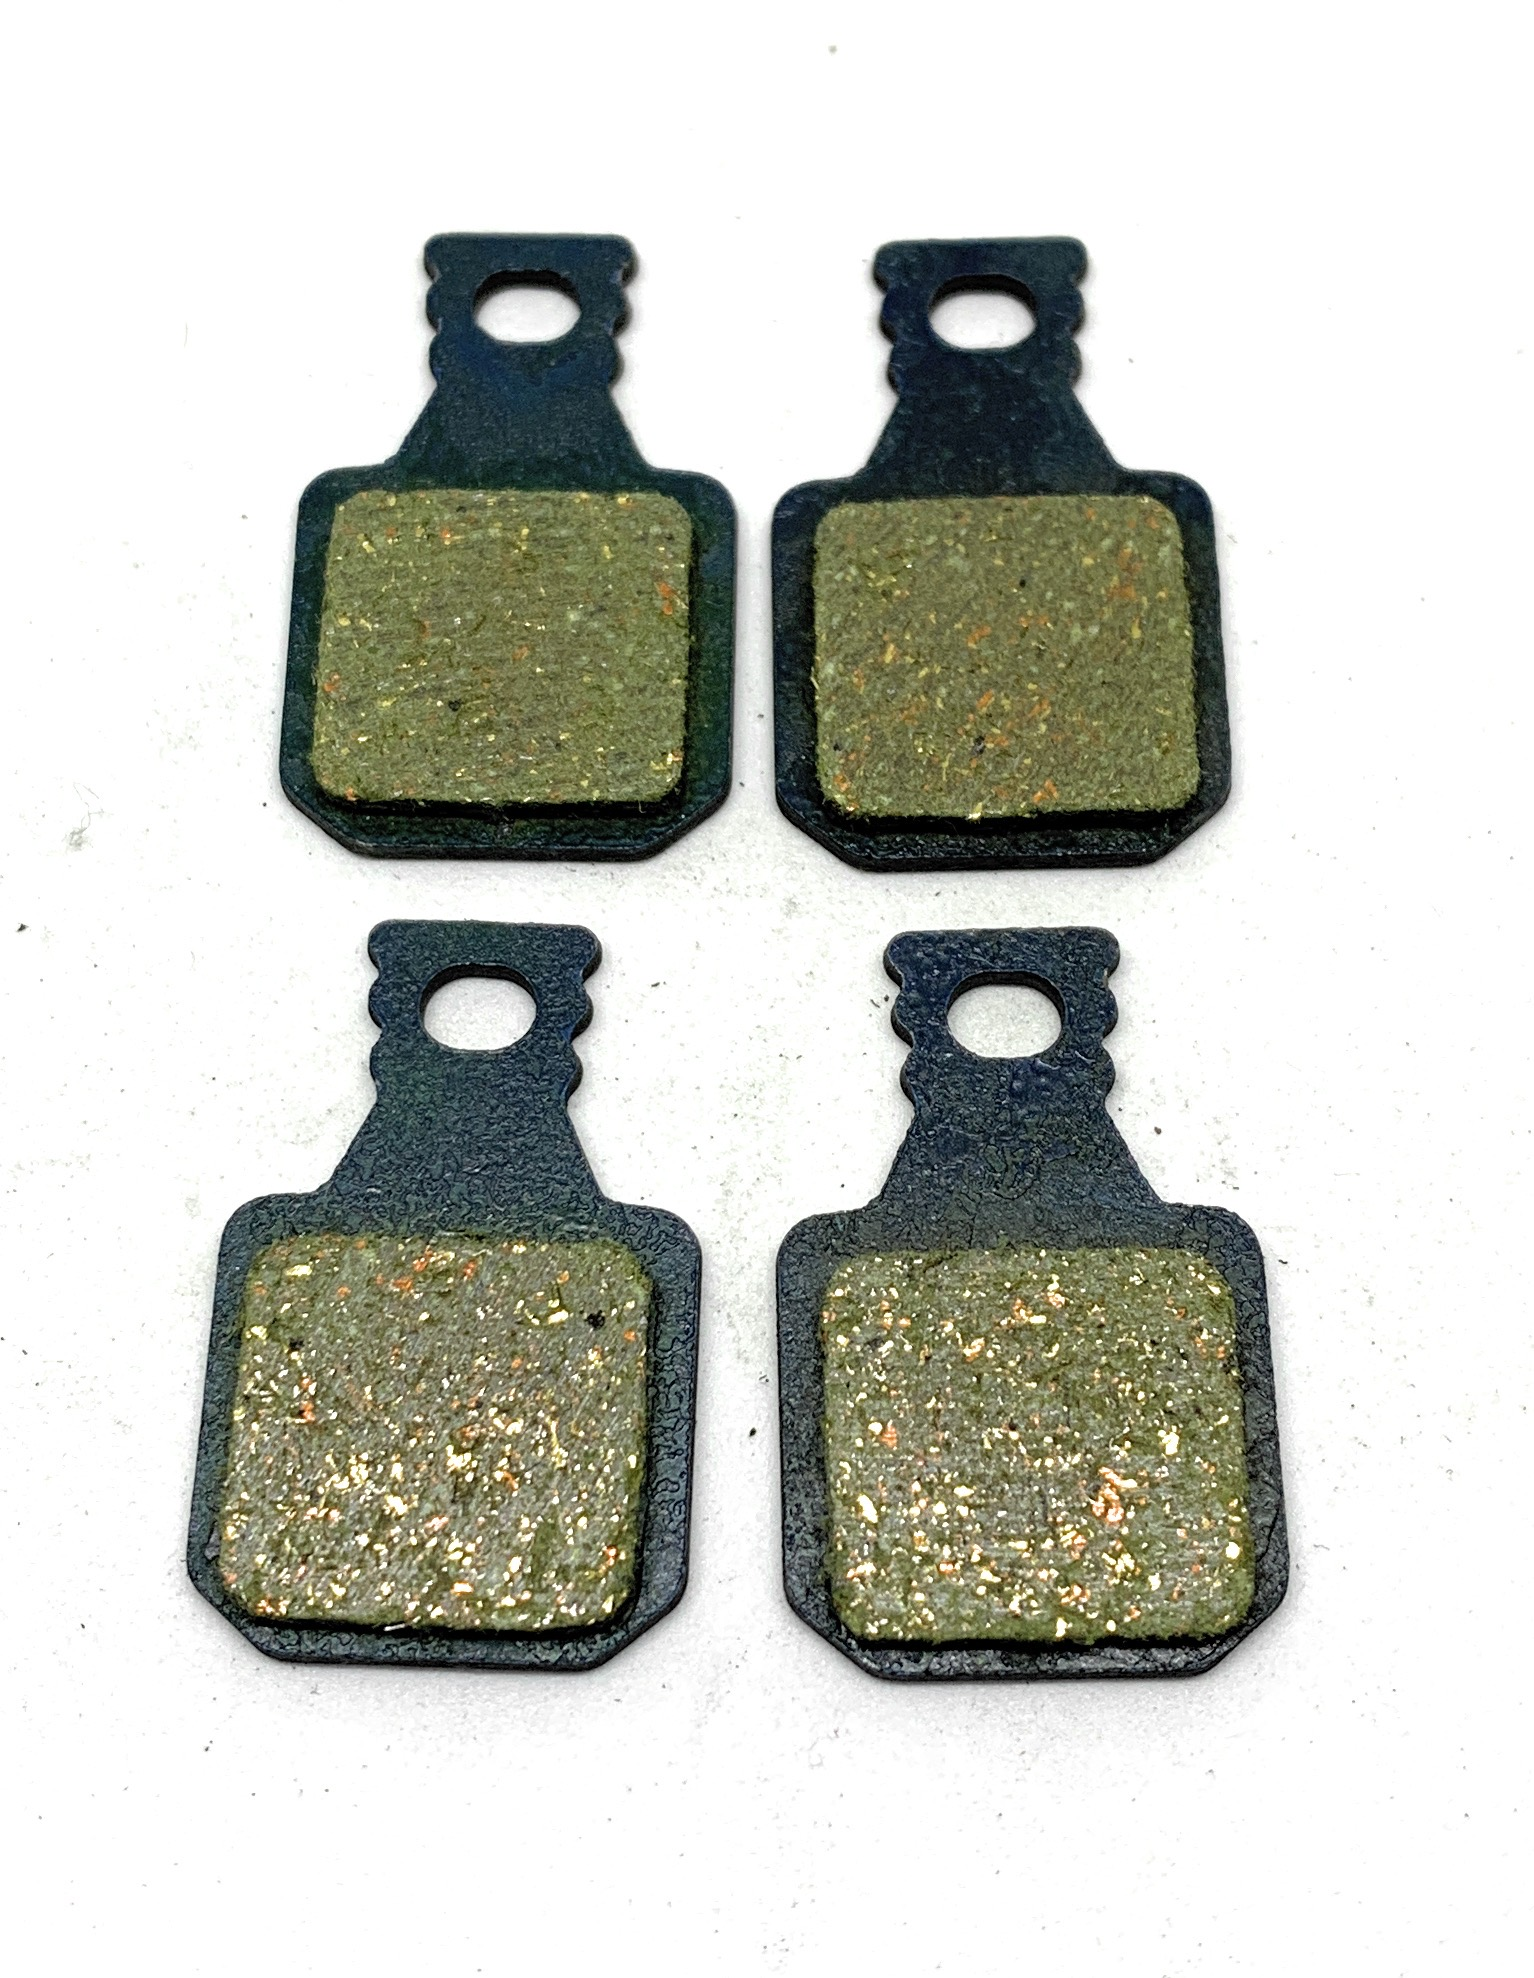 8pcs DiscoBrakes Magura MT5 Disc Brake Pads Sintered MT 5 Downhill XC 4 Sets